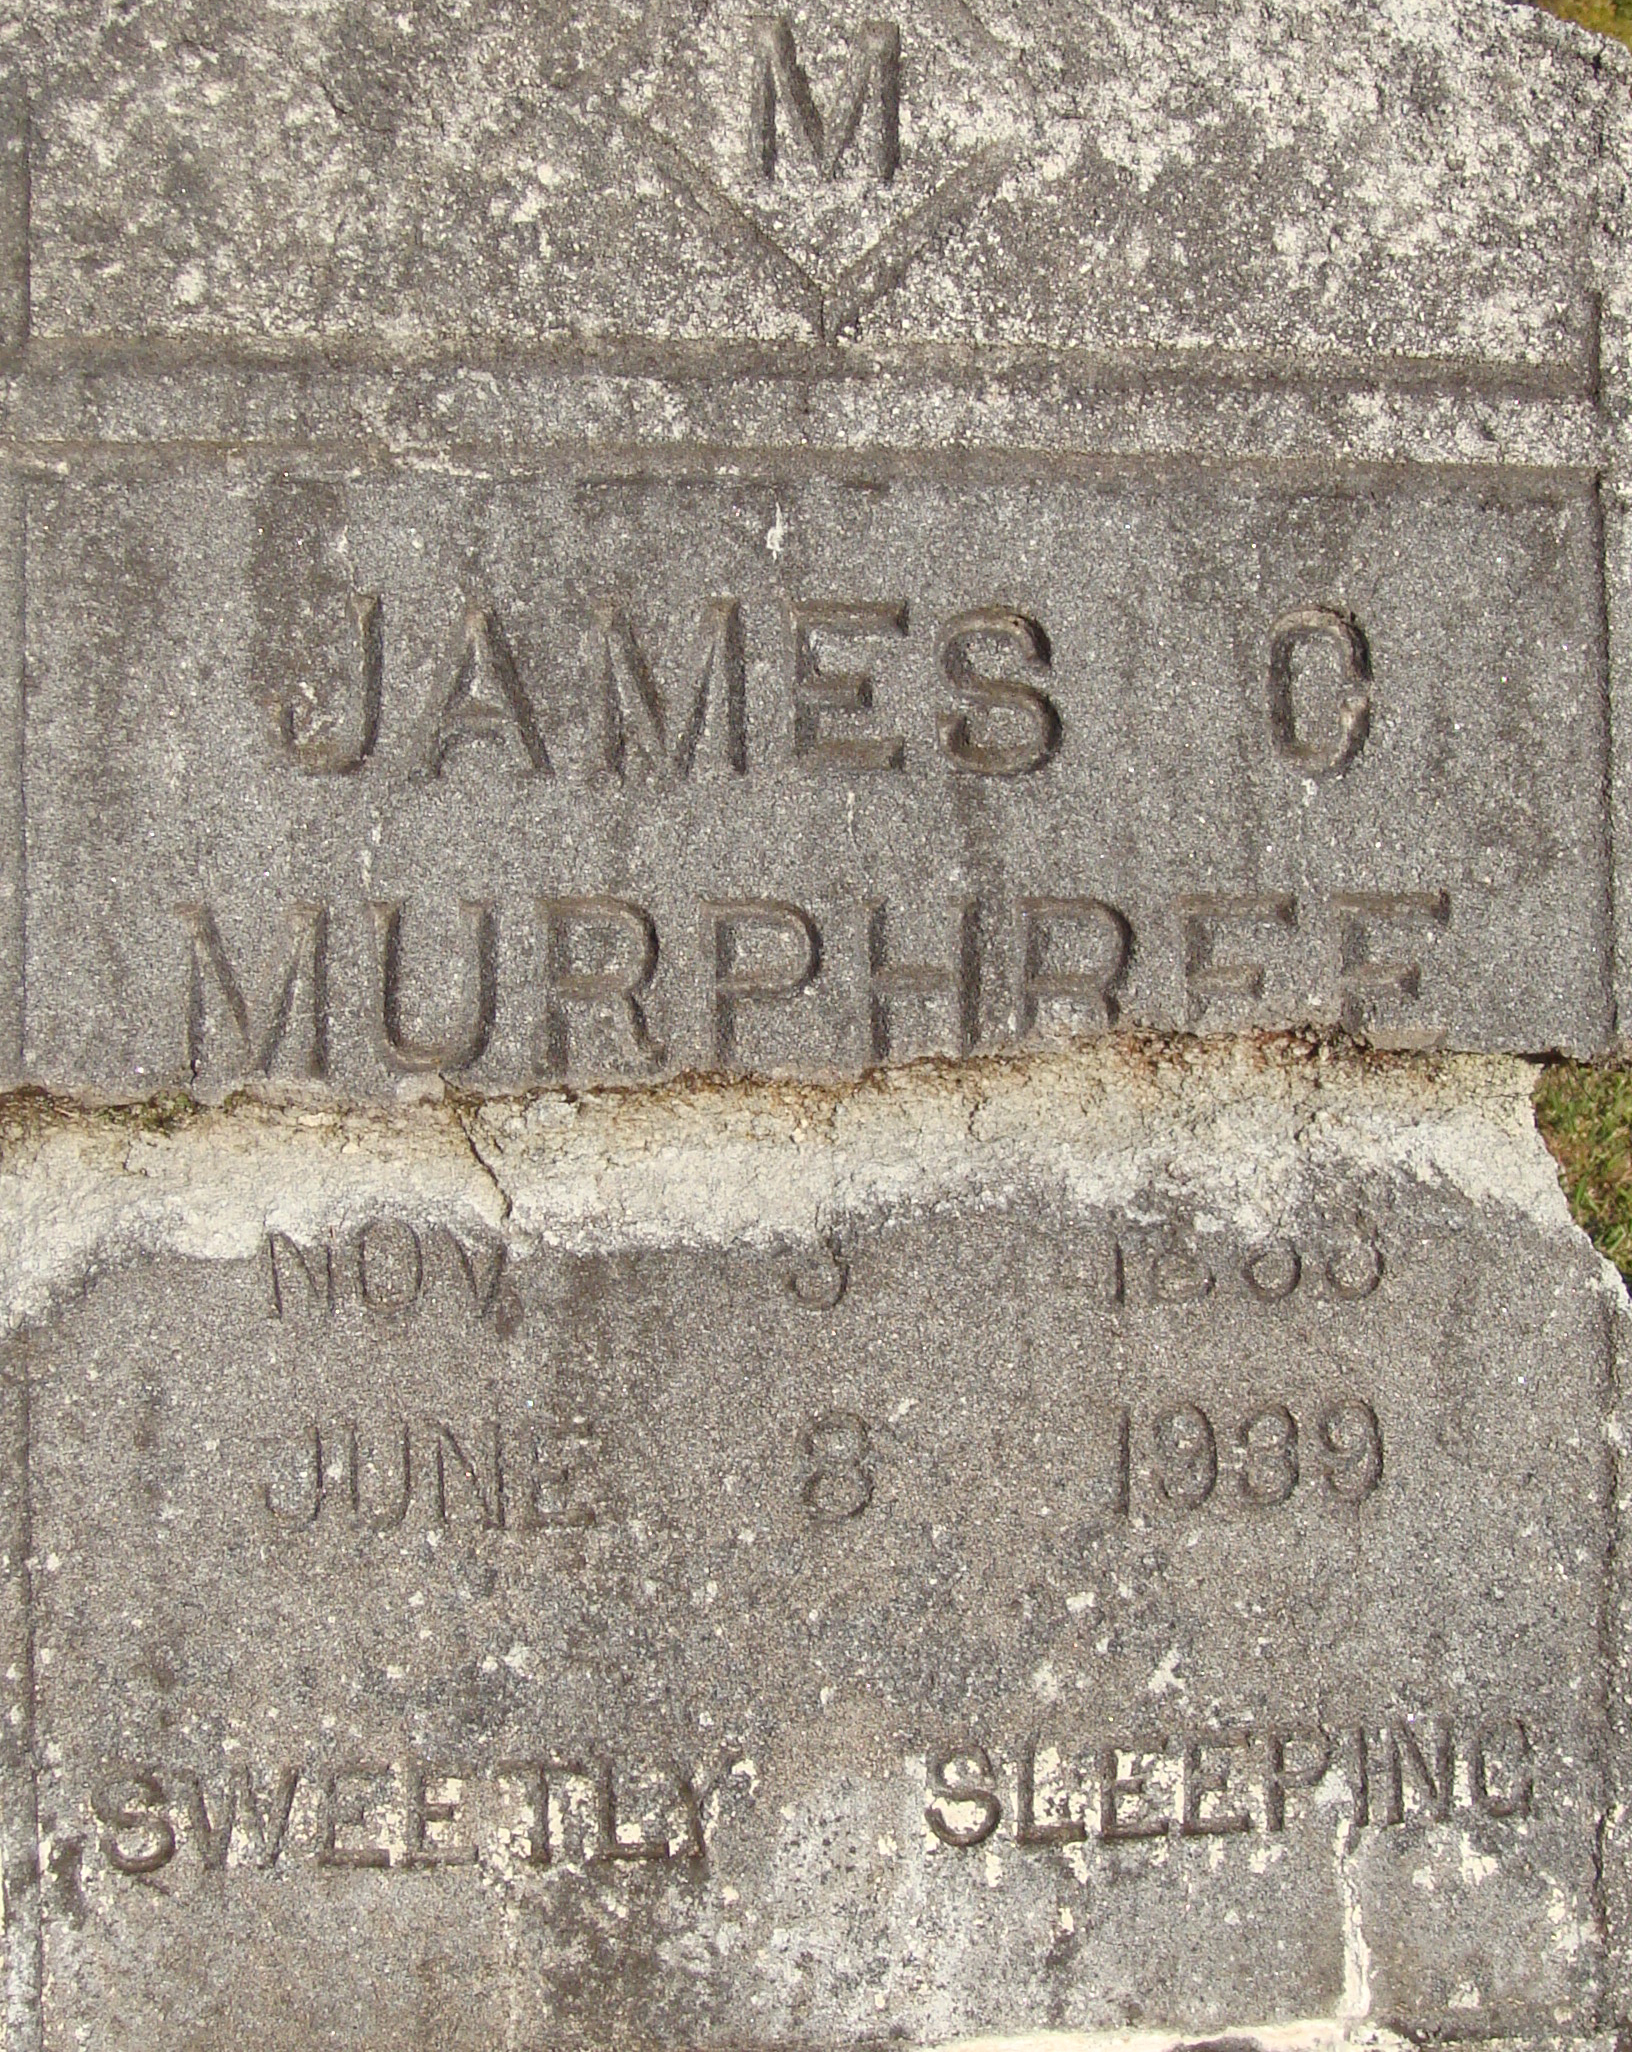 James Carroll Murphree